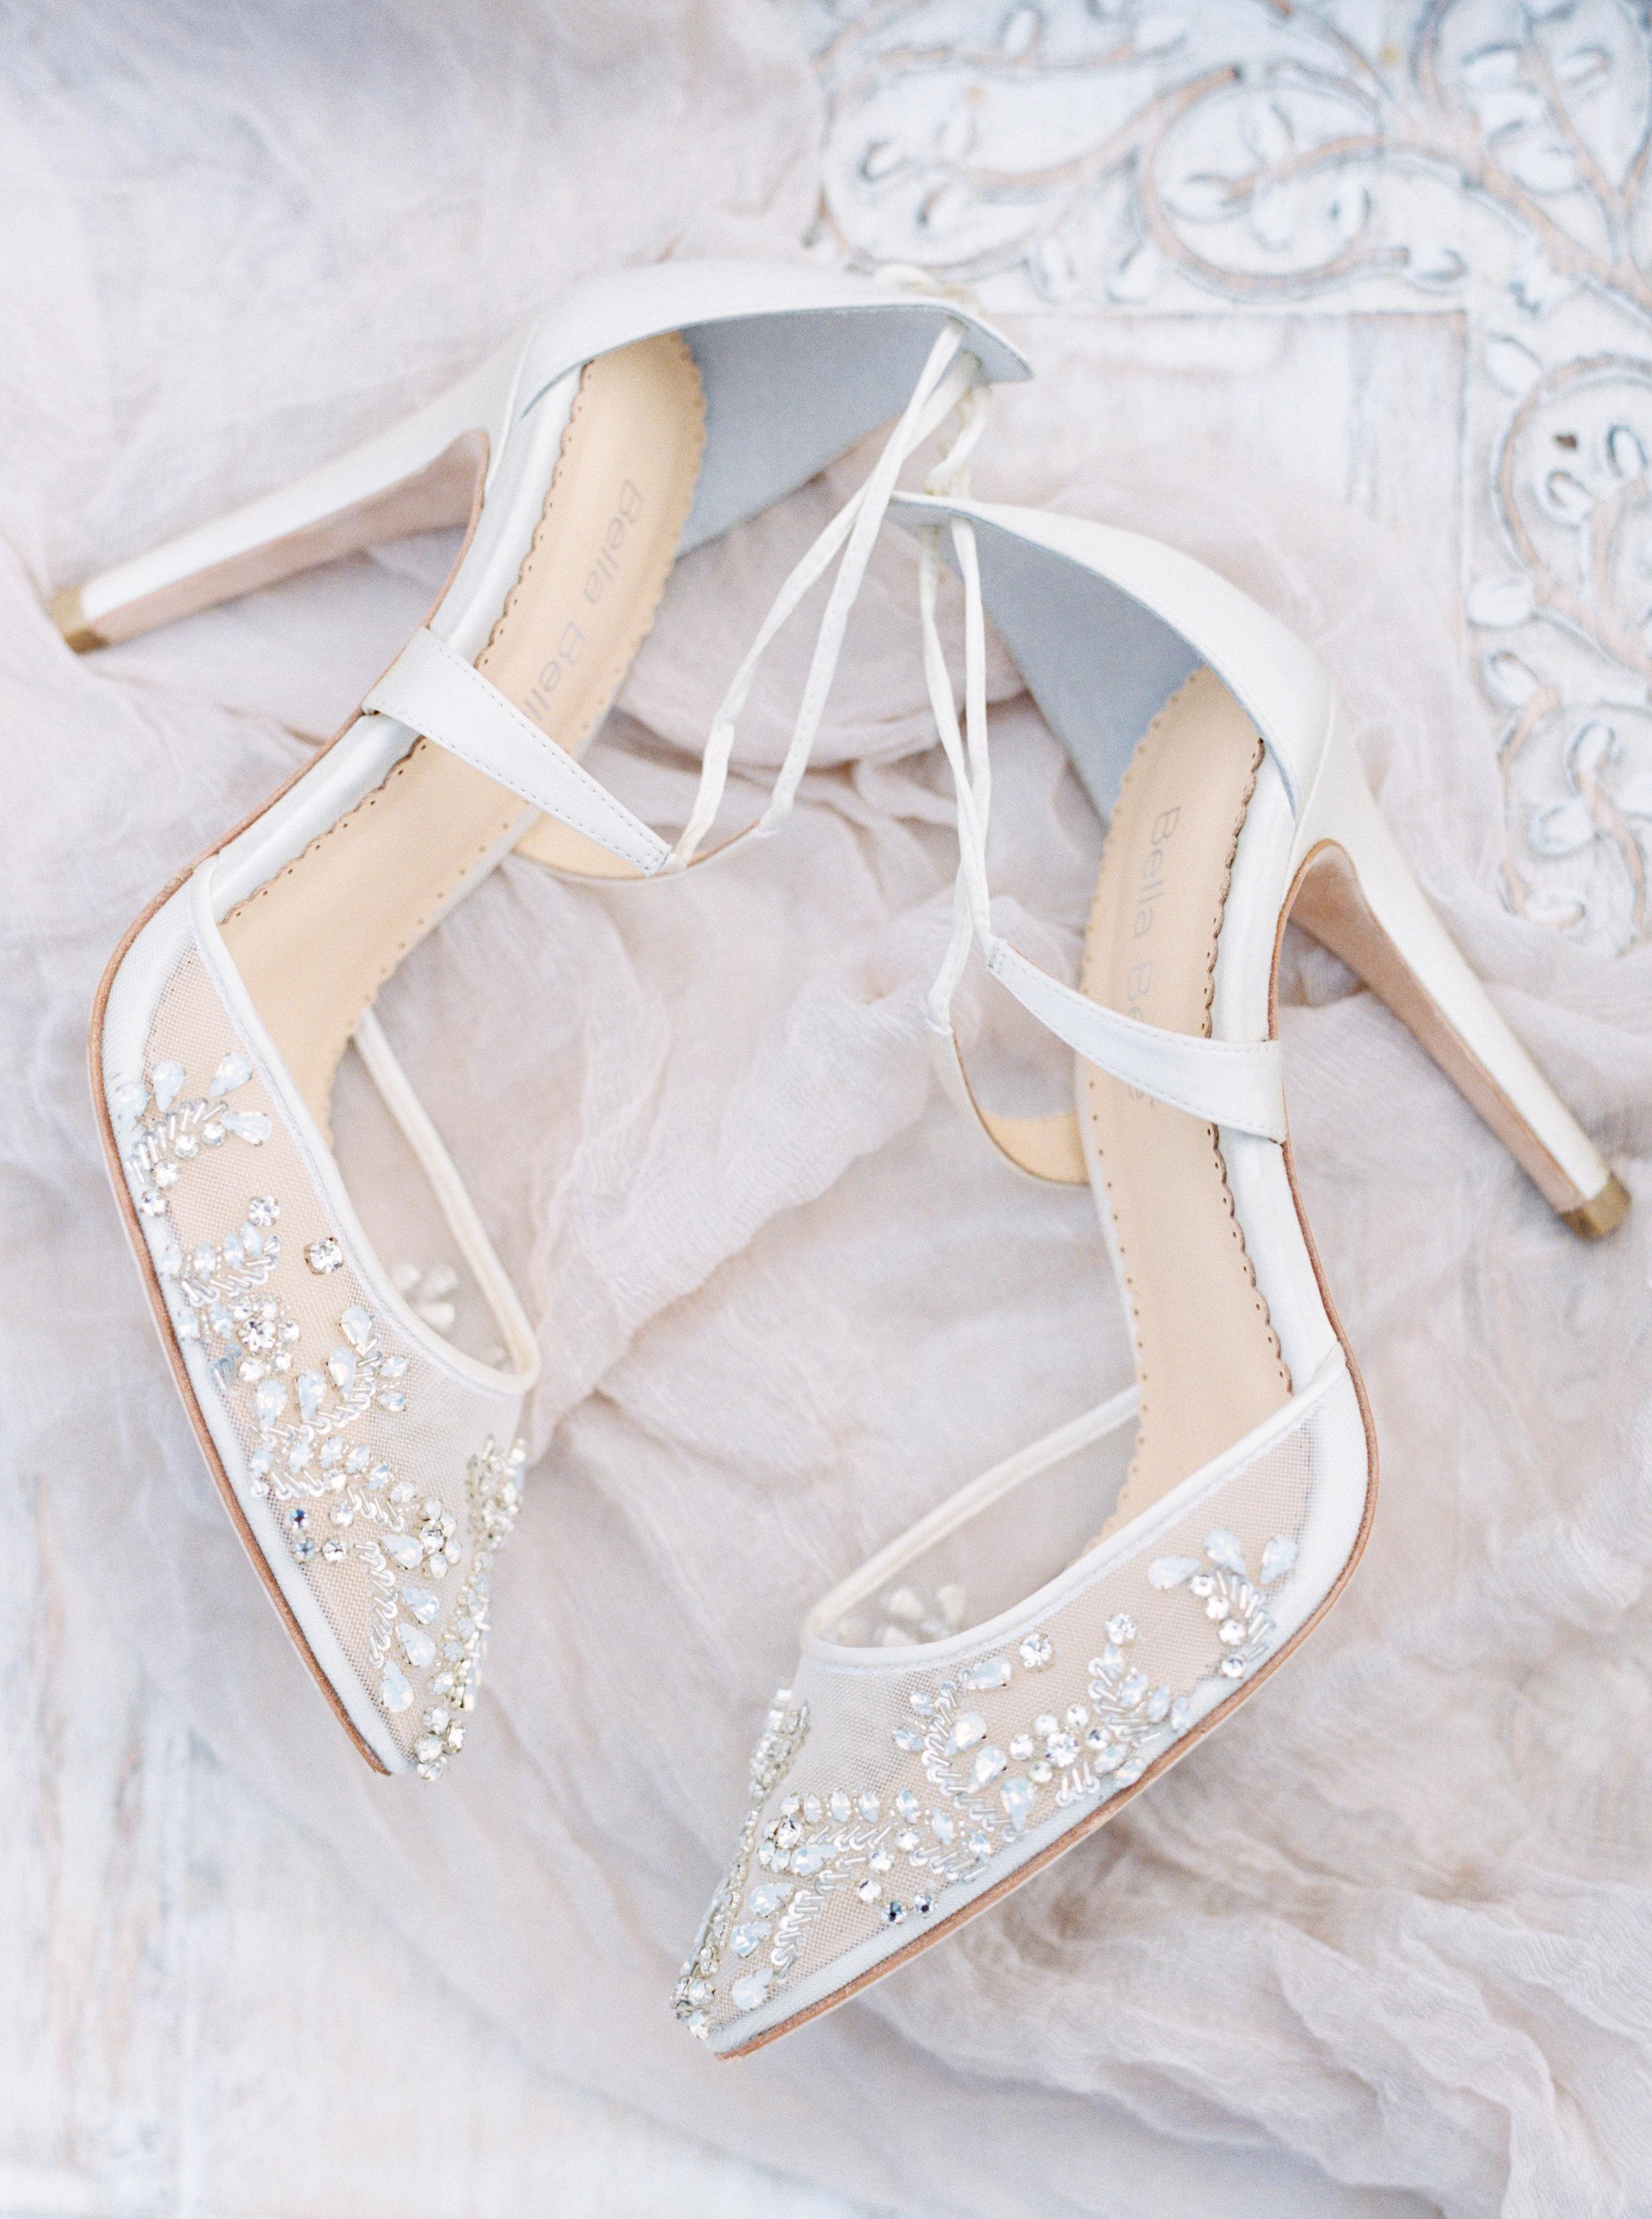 bella belle shoes austin wedding photographer jenna mcelroy